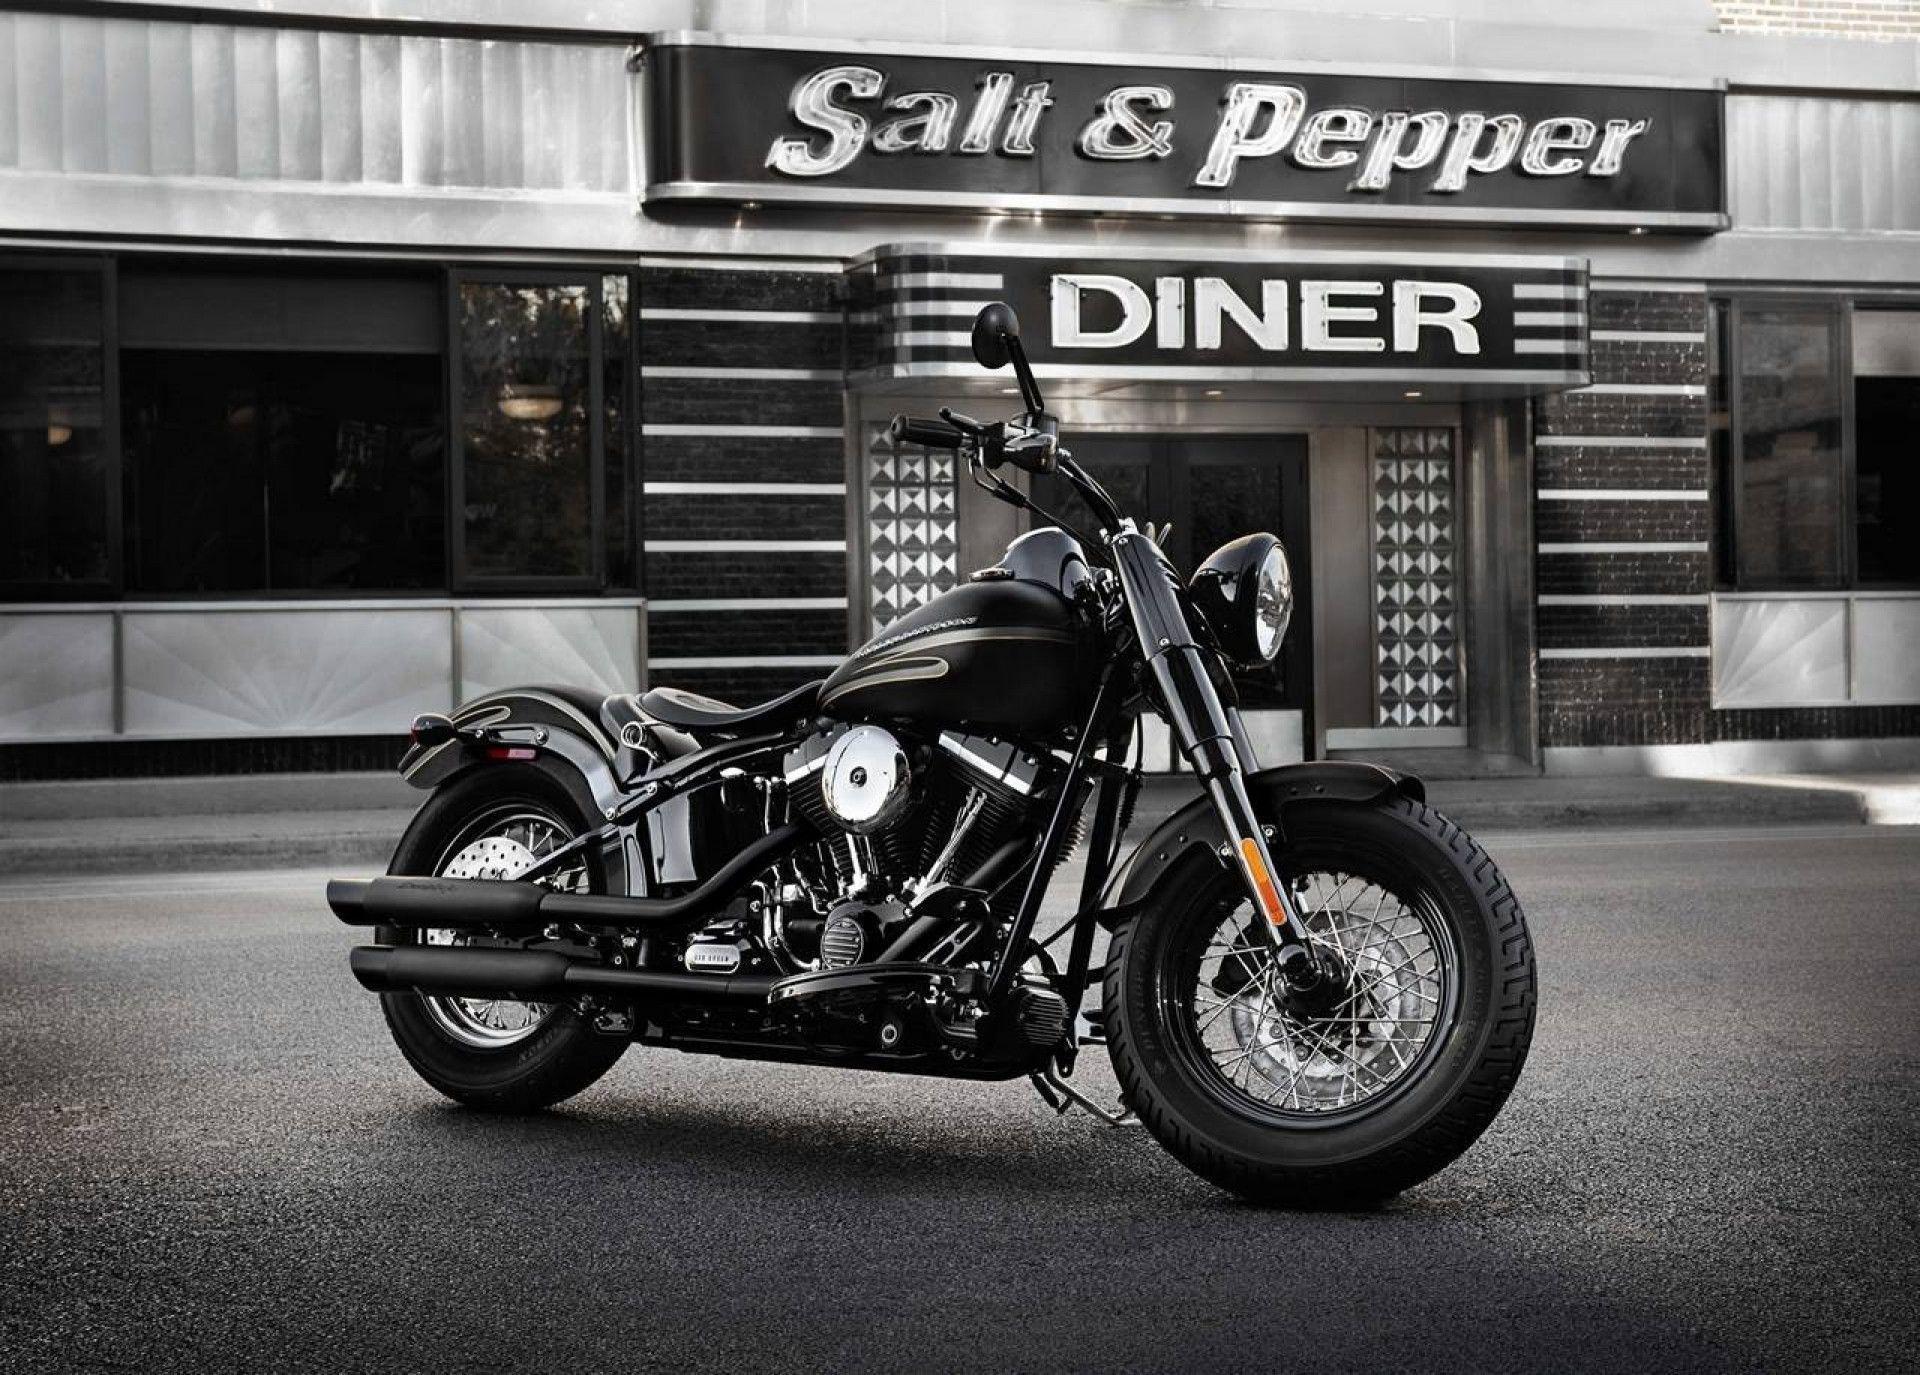 Harley Davidson Wallpapers Top Free Harley Davidson